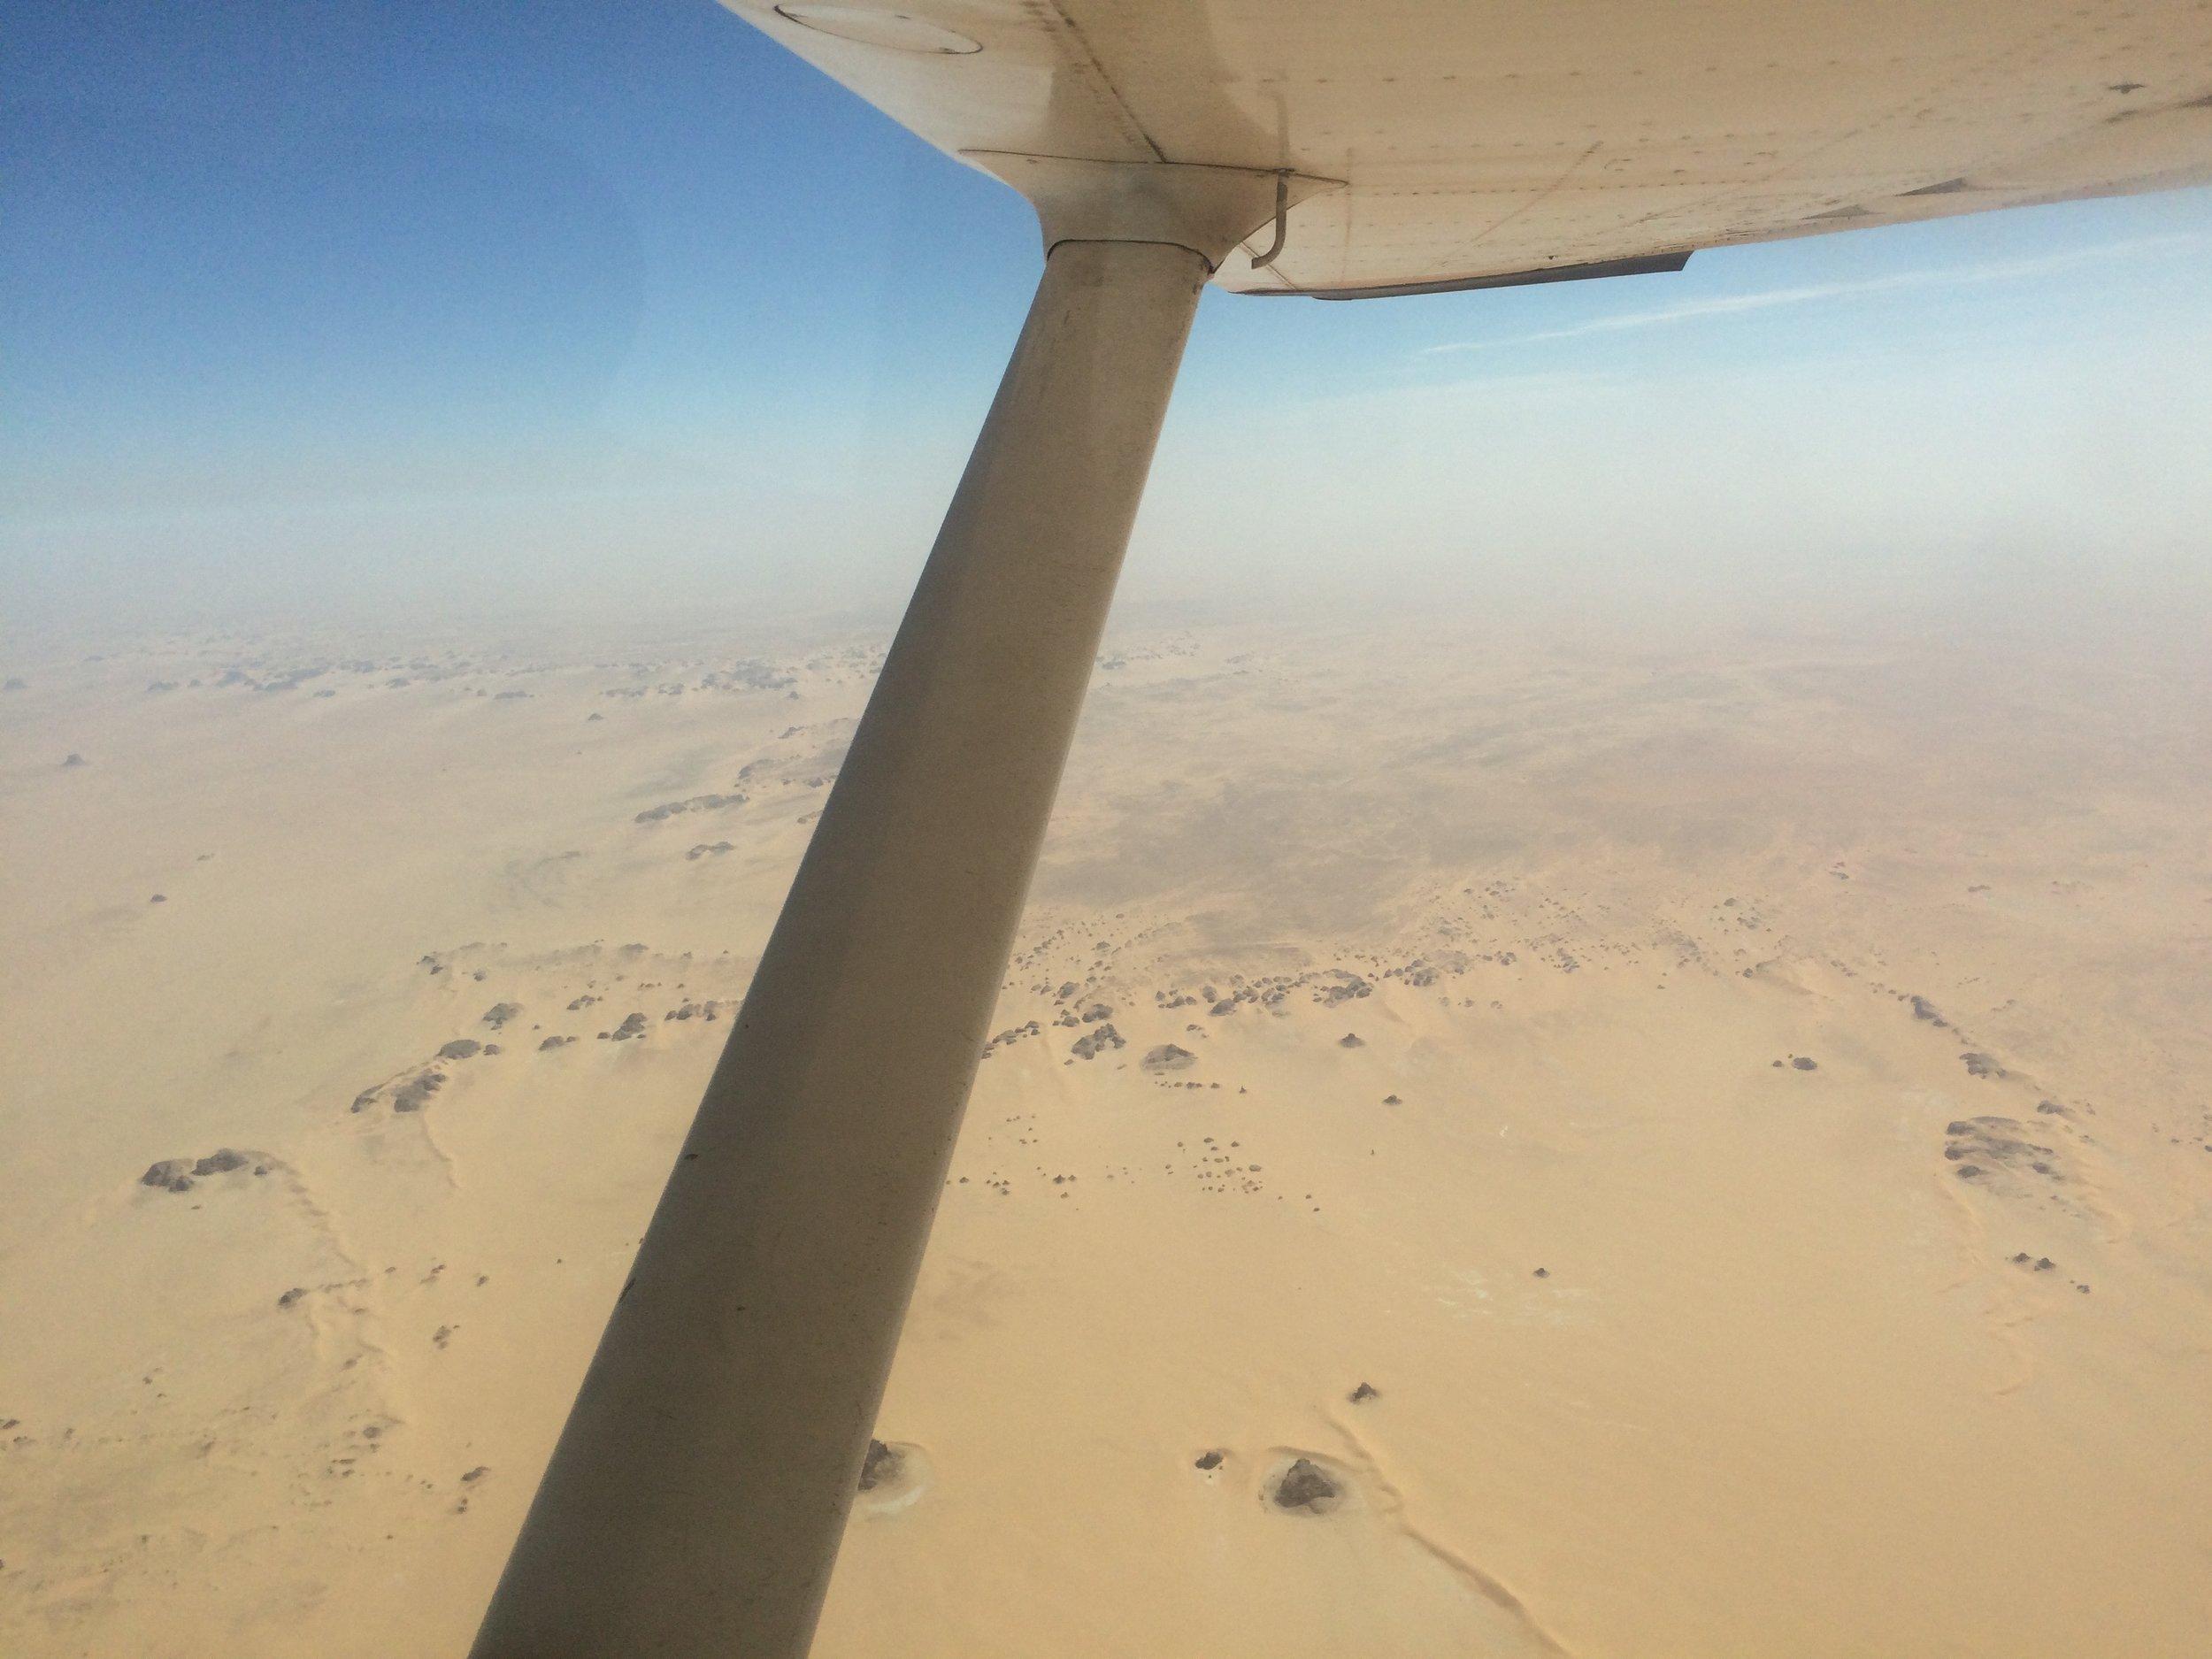 Flight over Sahara